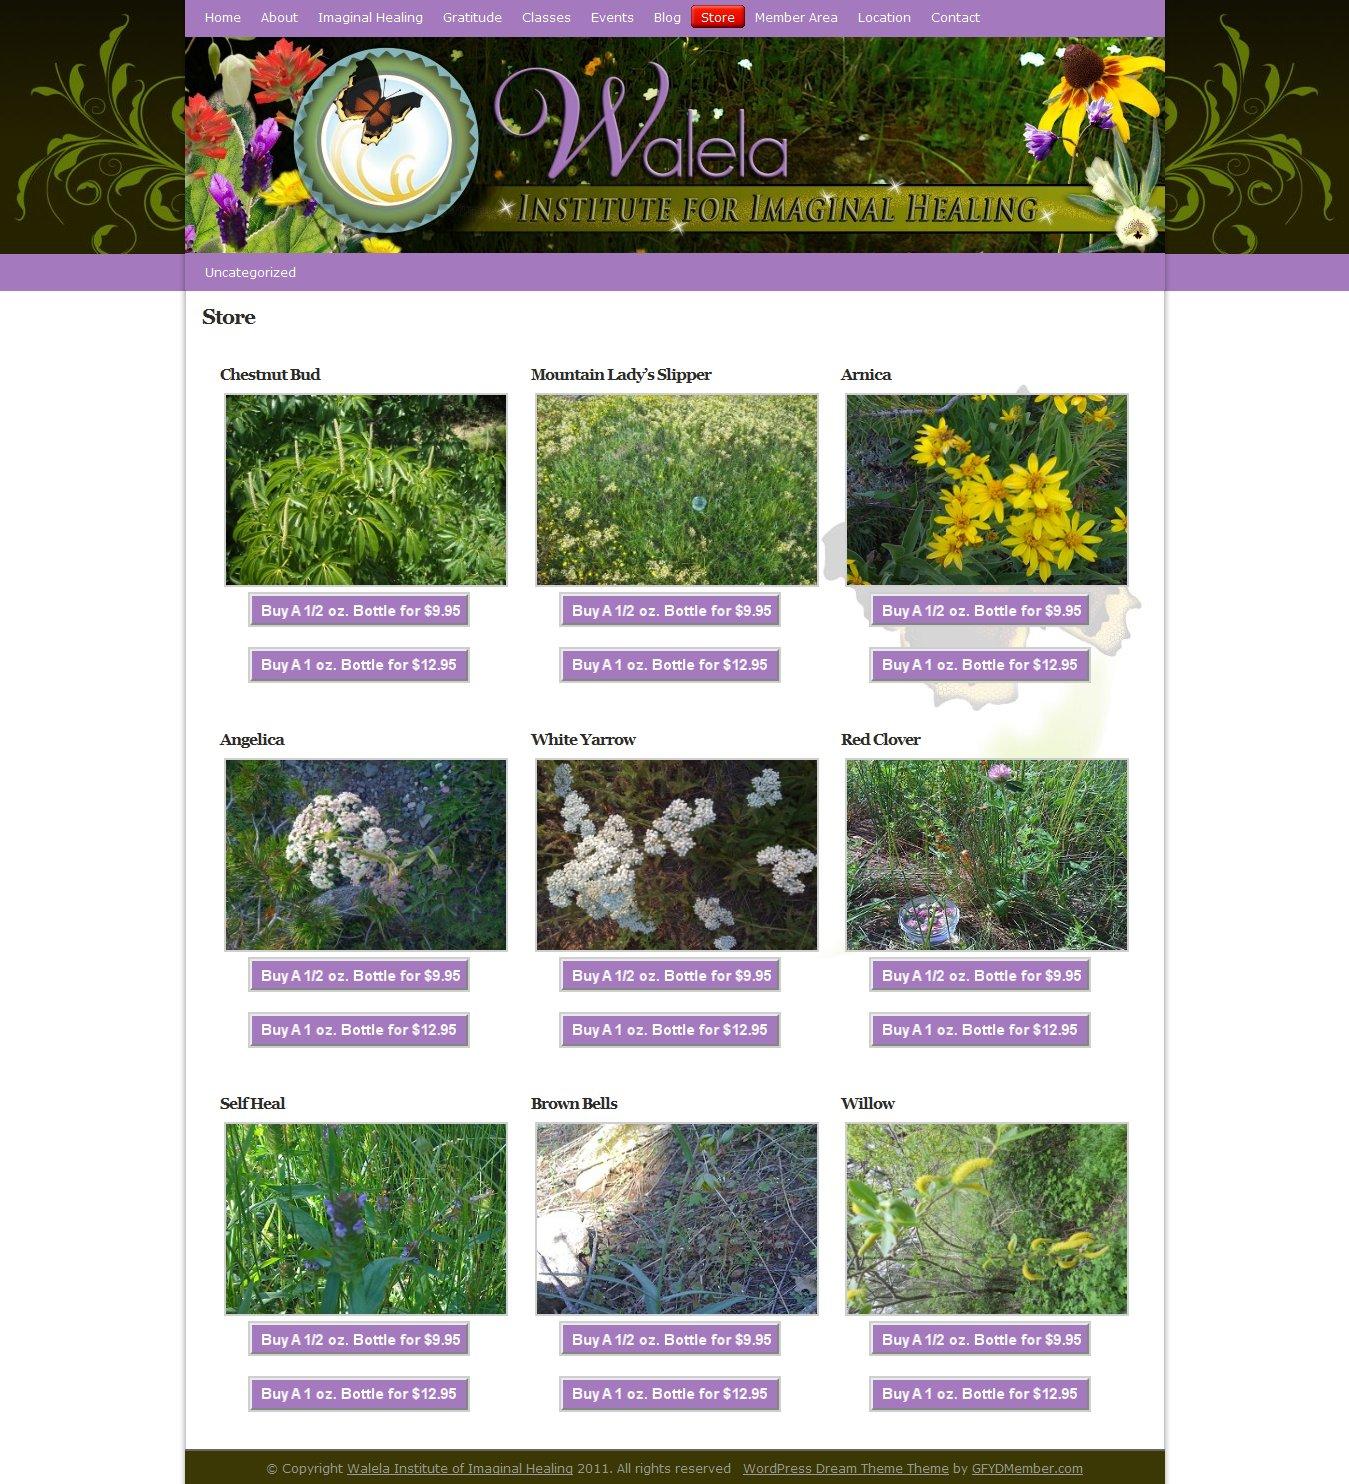 Walela Healing Institute – Website Design